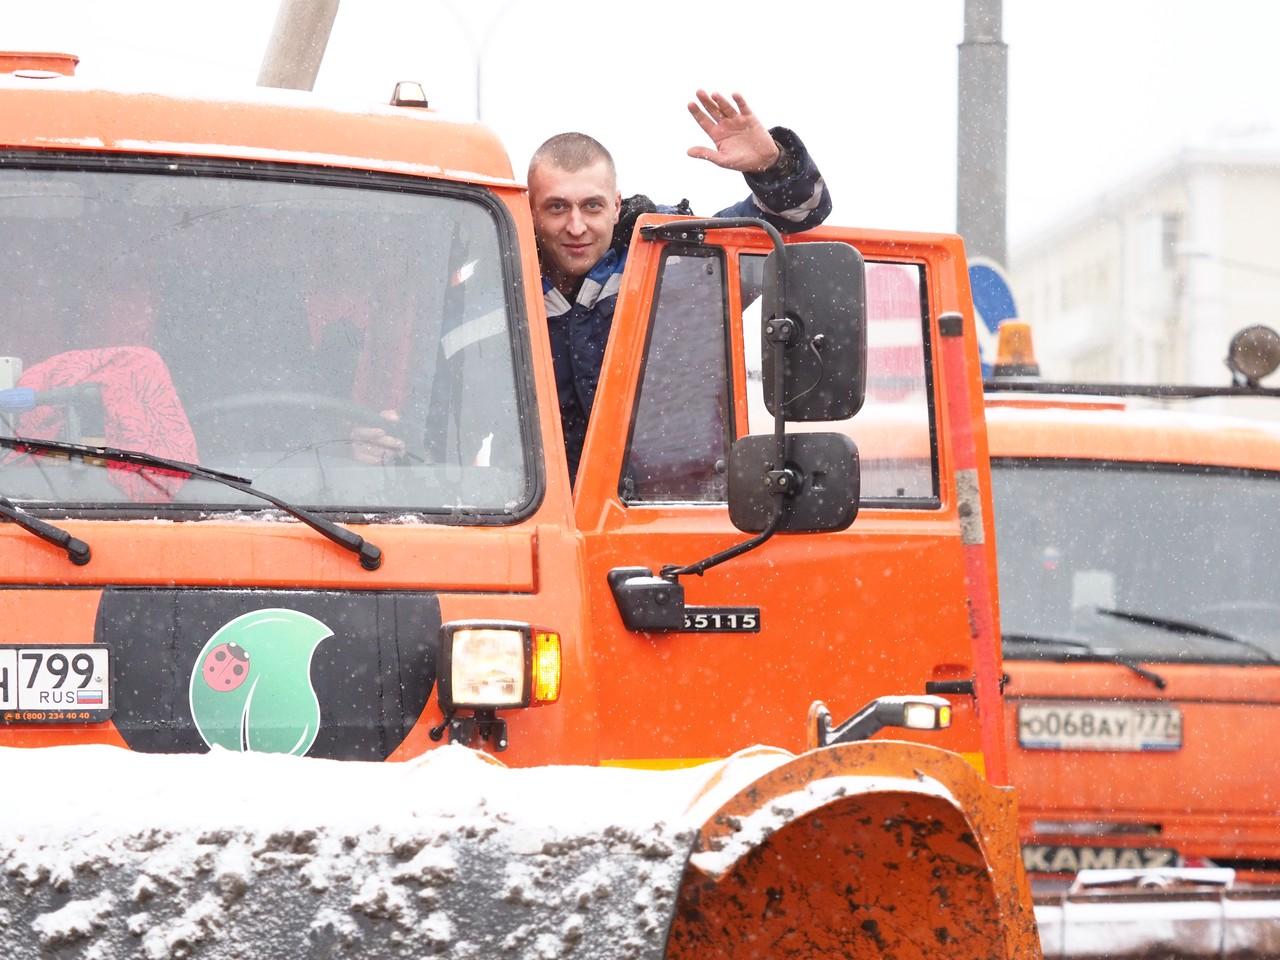 Почти 200 единиц техники обеспечат перевод транзитных грузовиков на ЦКАД